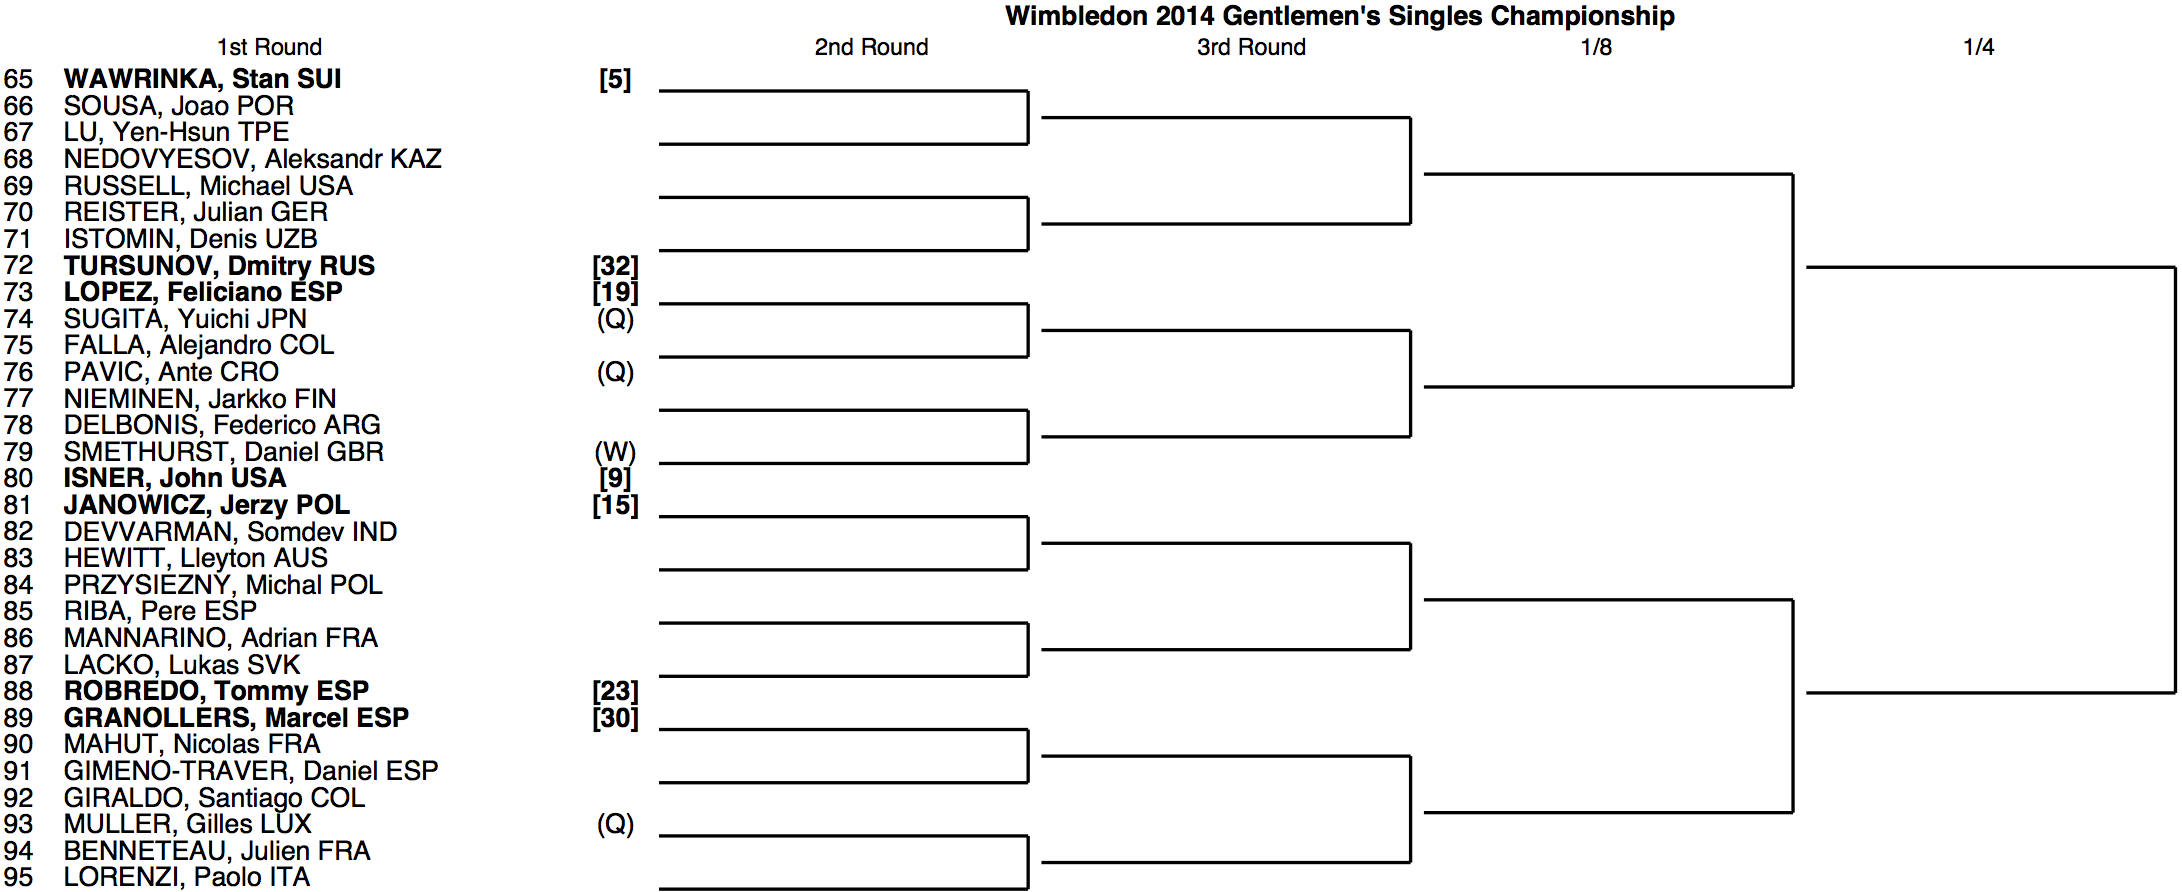 Wimbledon 2014 Draw 3:4